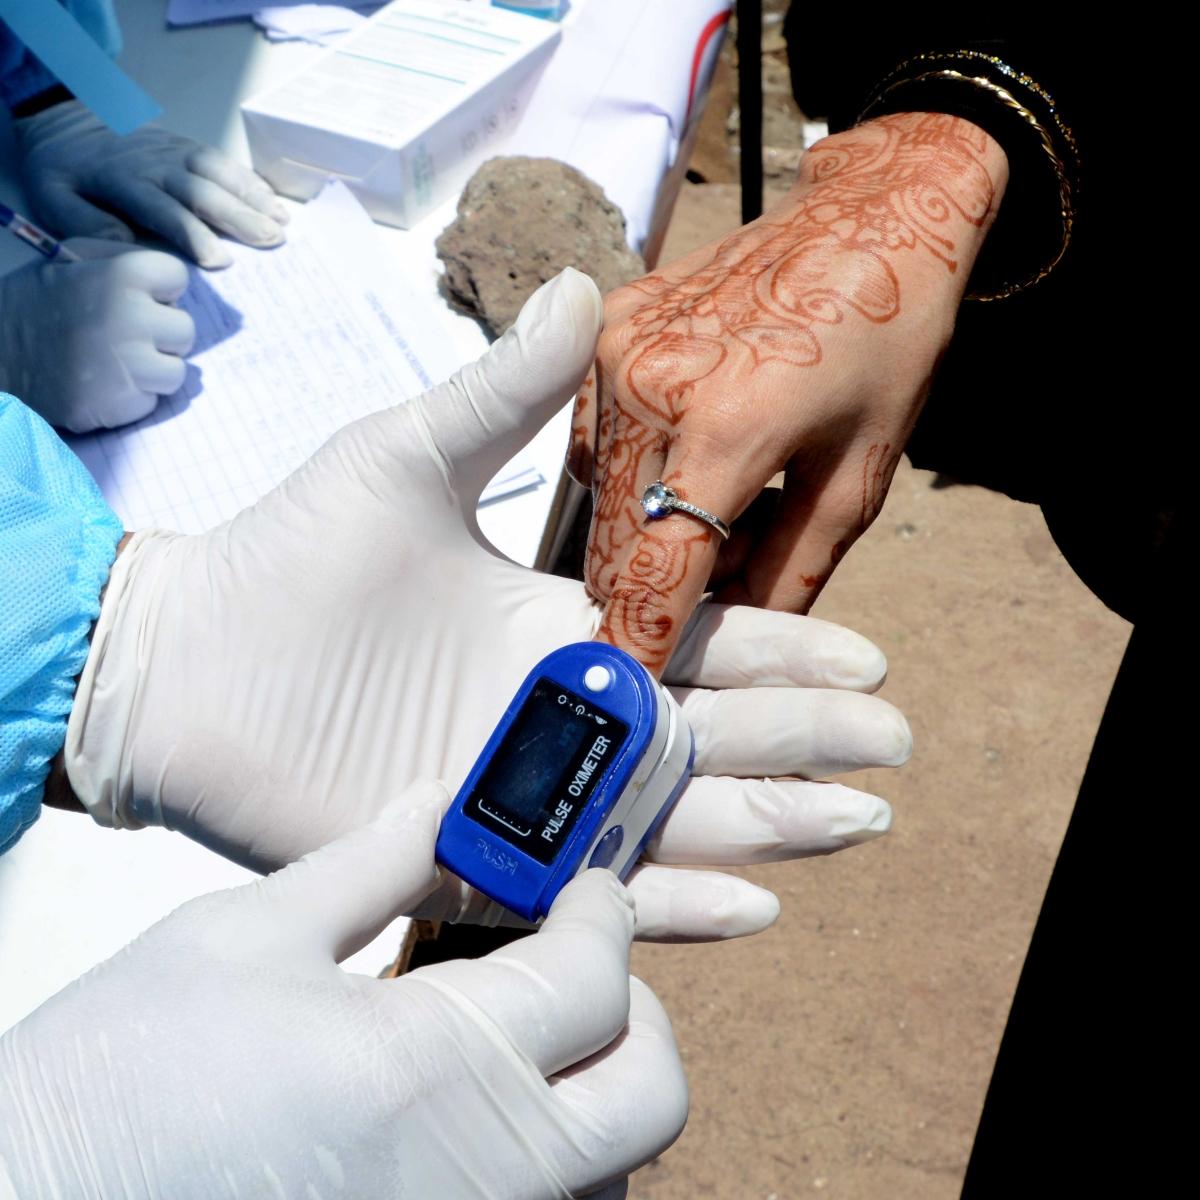 Coronavirus in Mira-Bhayandar: Five-day old girl among 18 new COVID-19 cases on Saturday